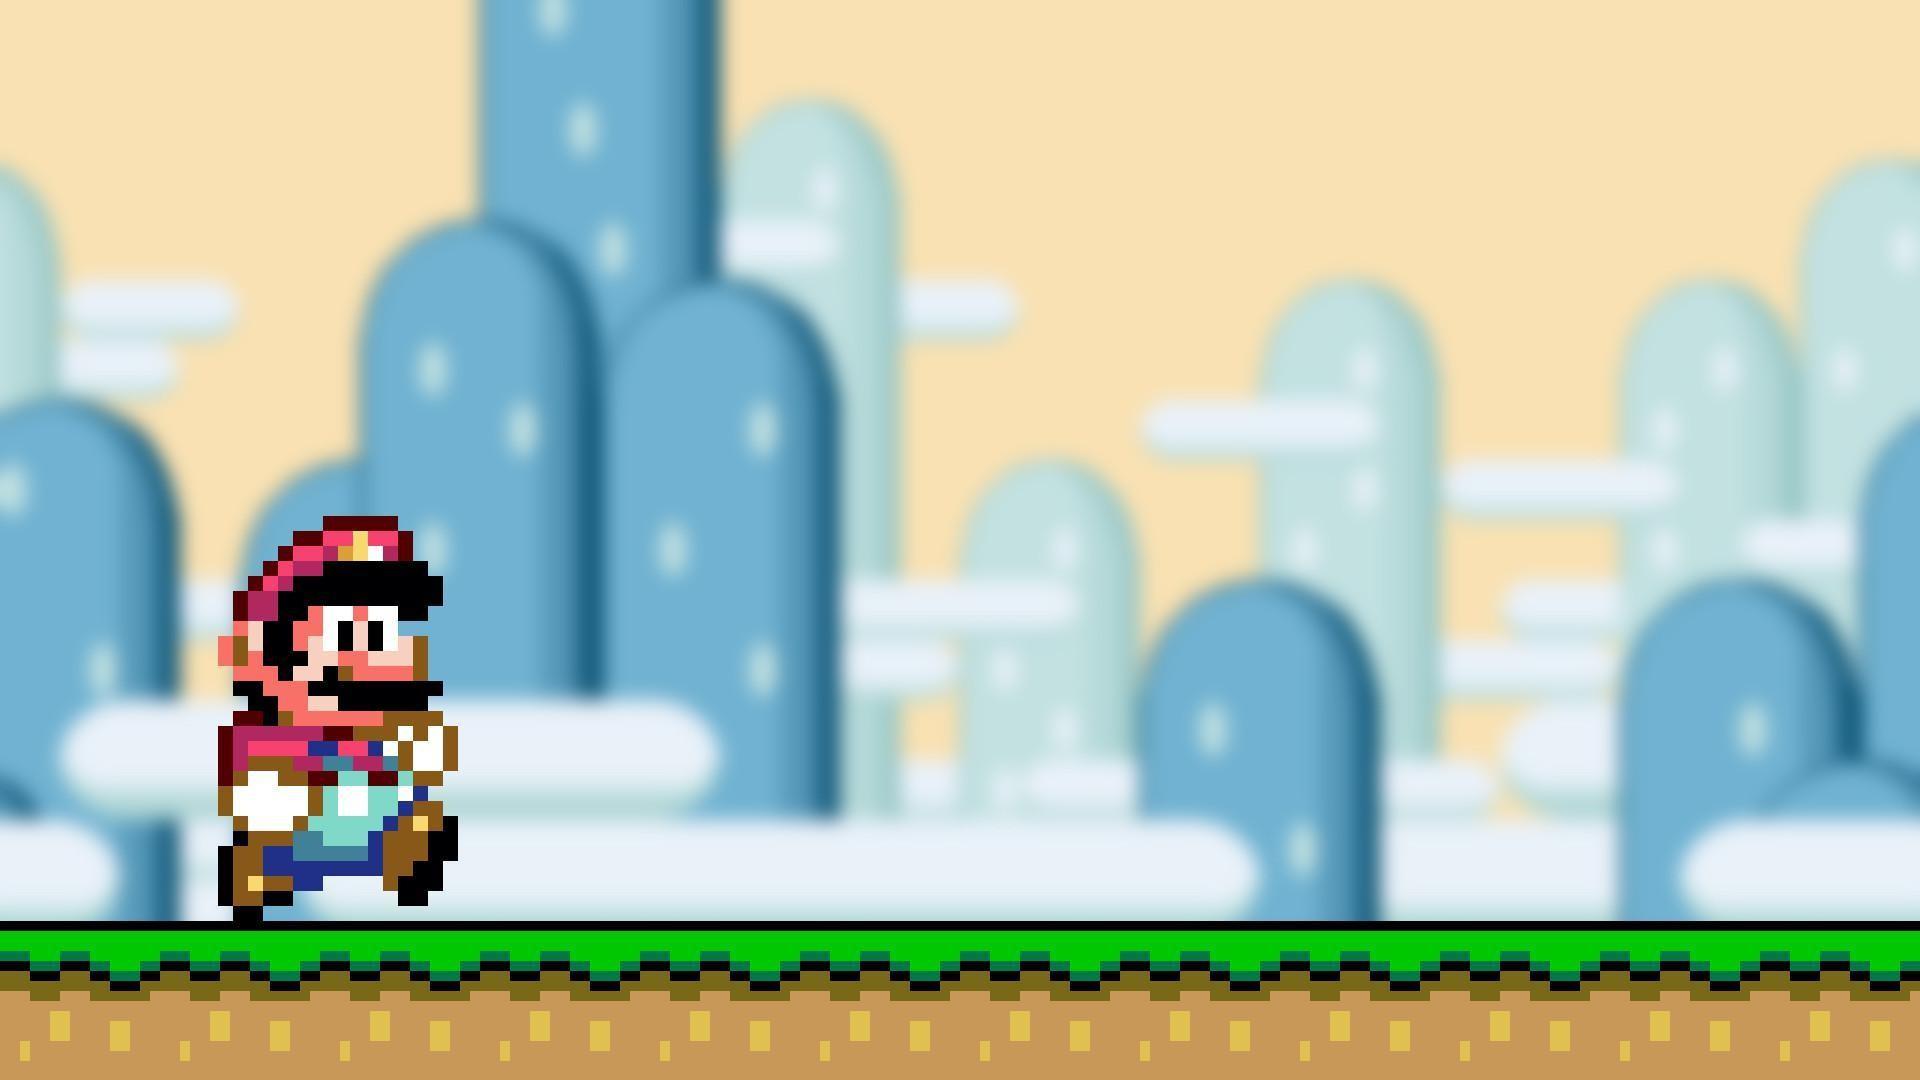 Res: 1920x1080, 16-Bit-Spiel Super Mario